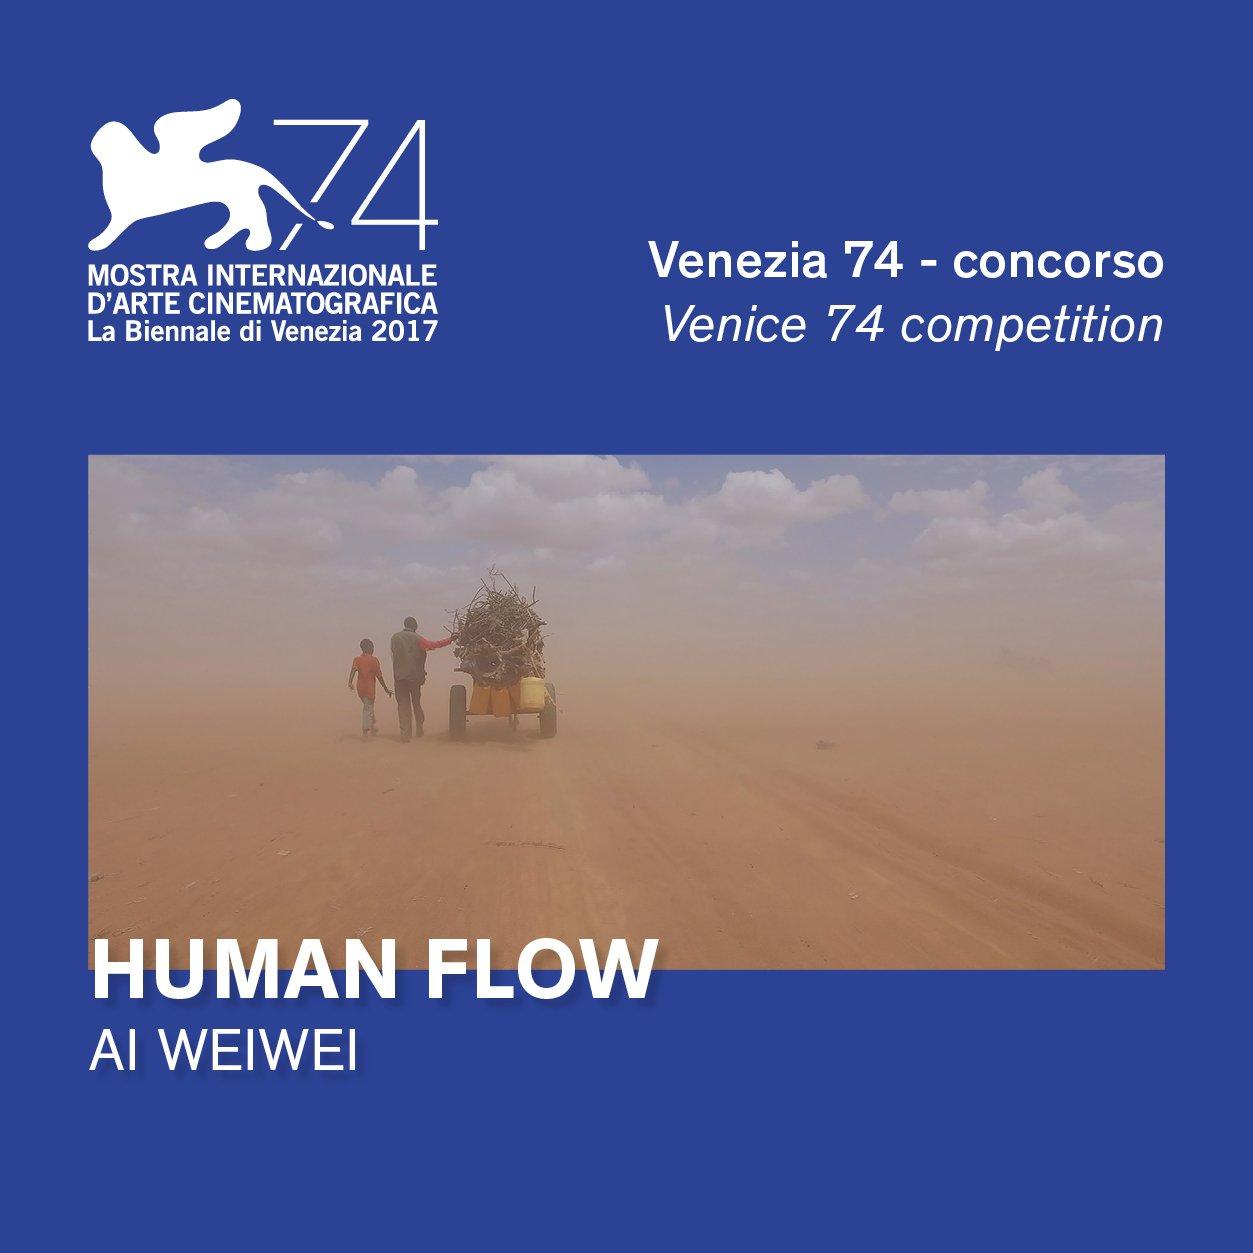 Festival de Veneza 2017 21/21